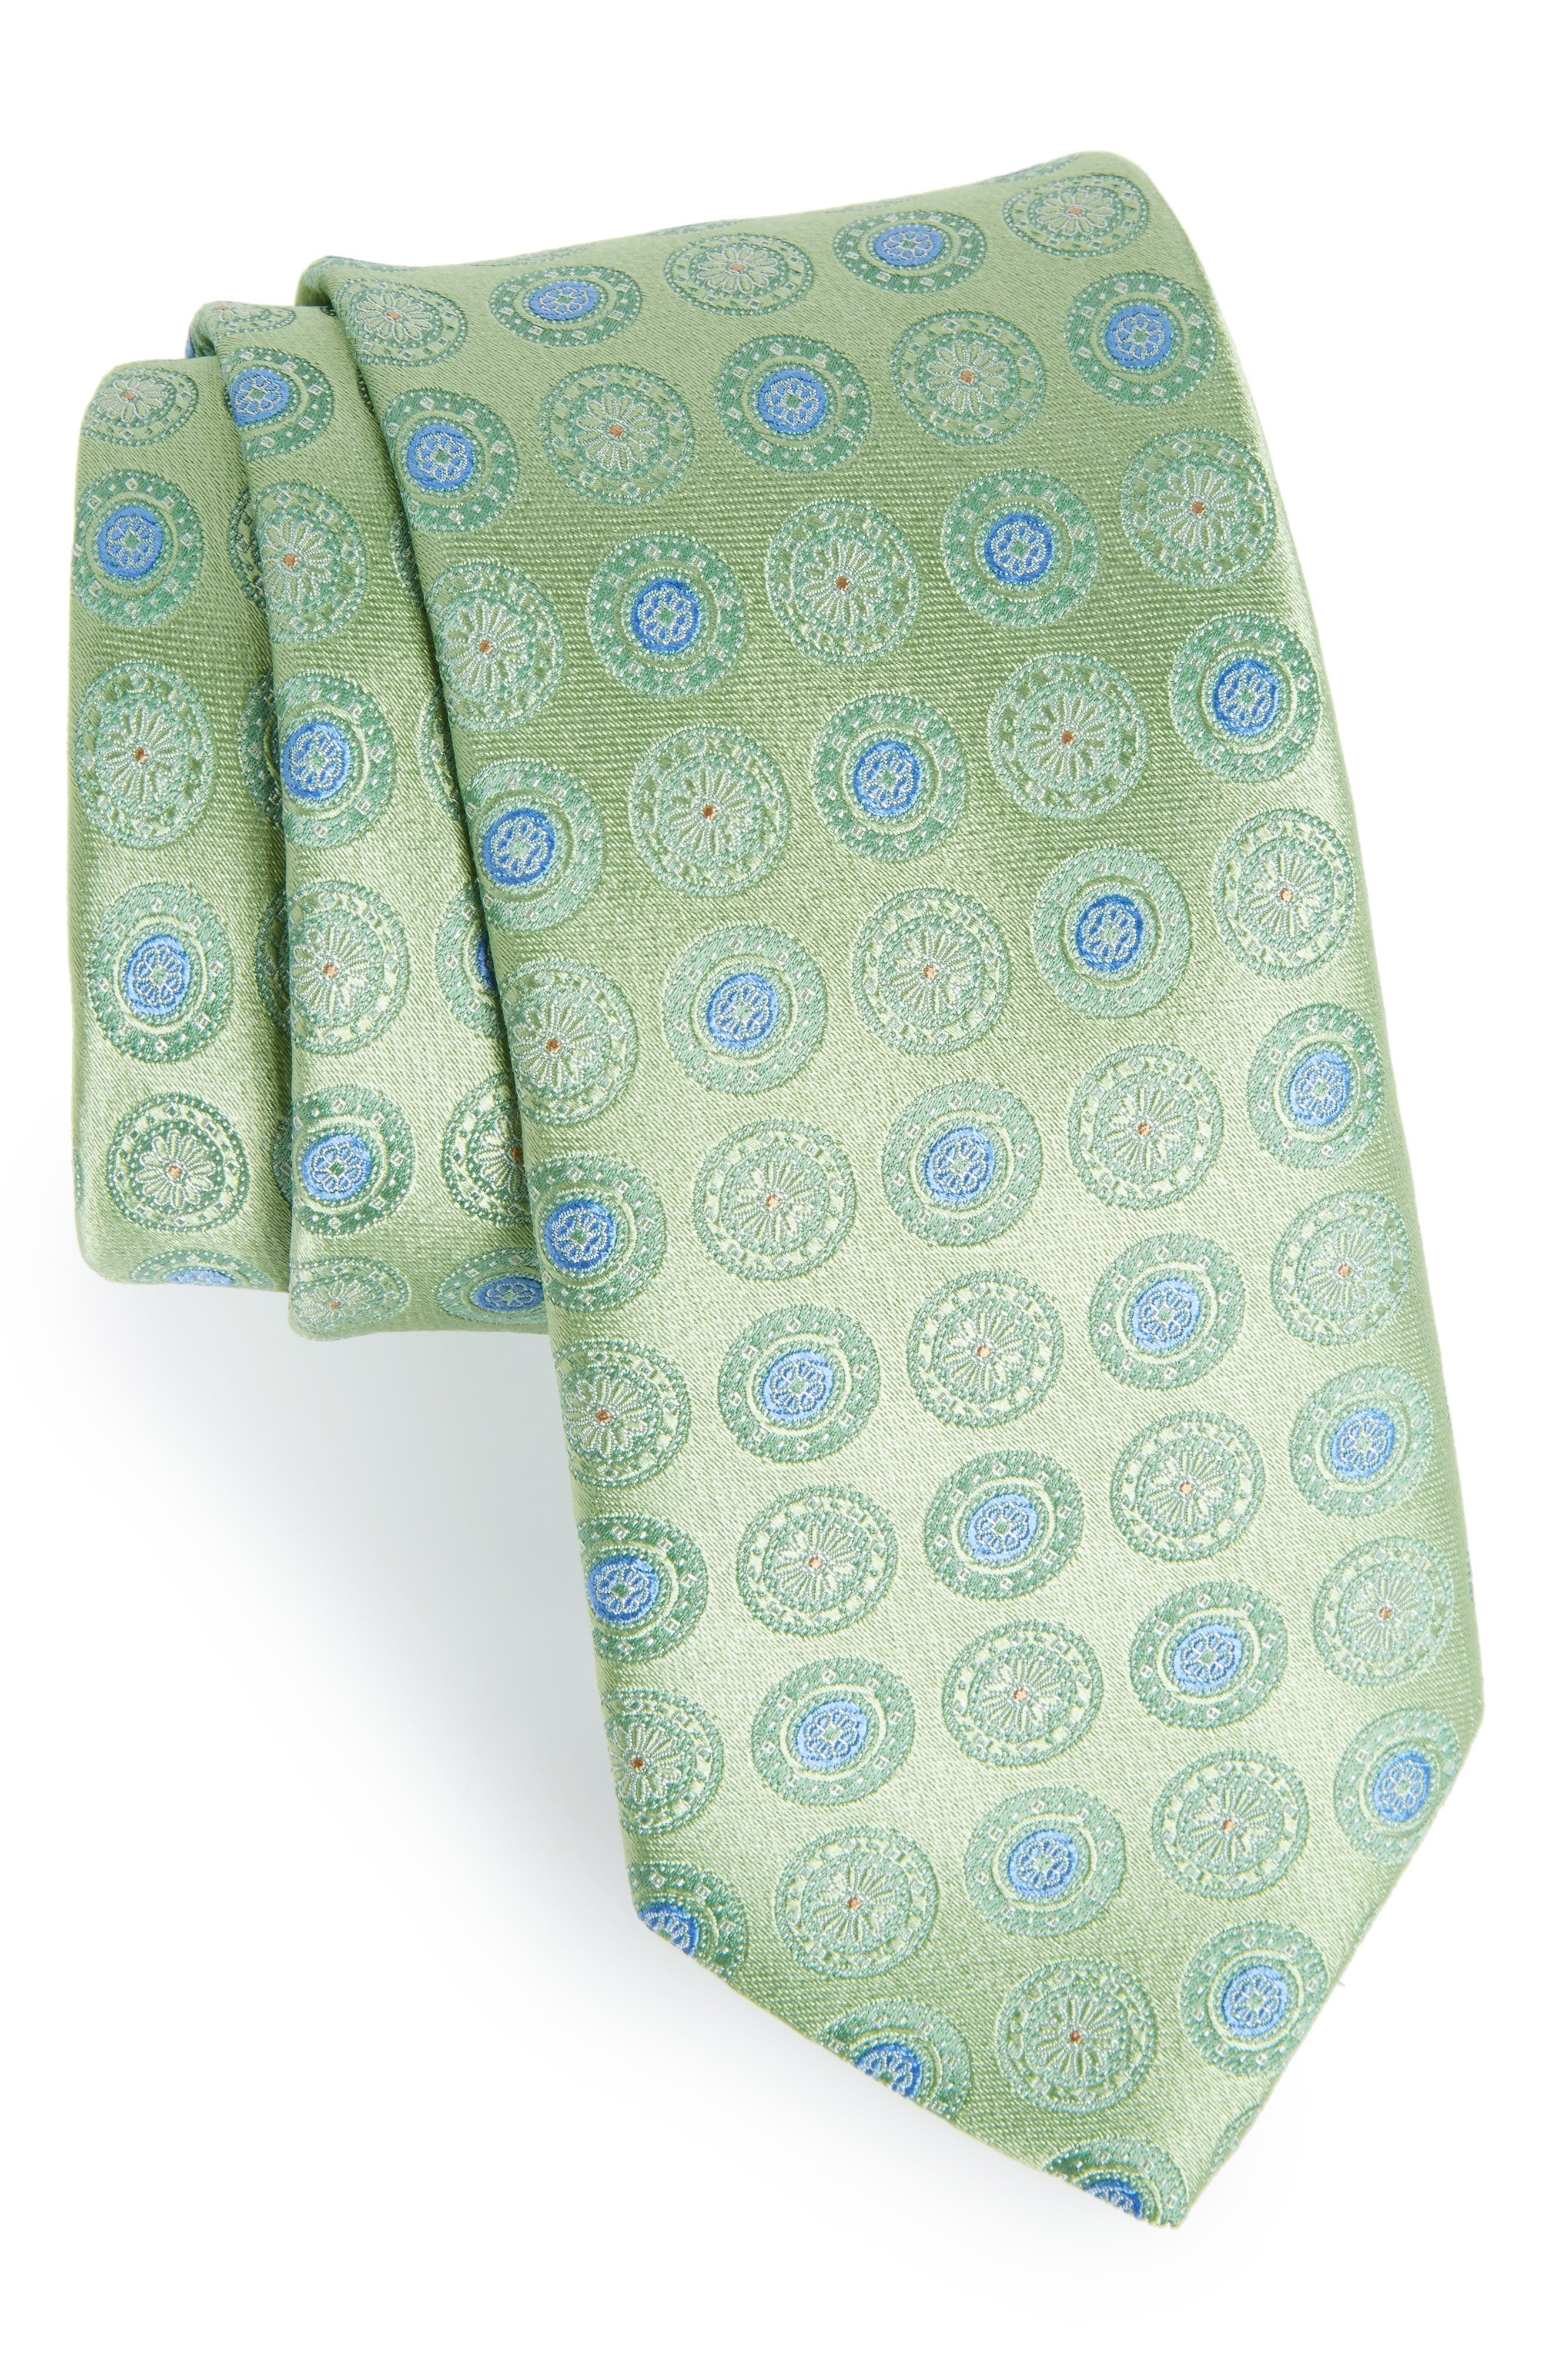 Alternate Image 1 Selected - John W. Nordstrom® Medallion Silk Tie